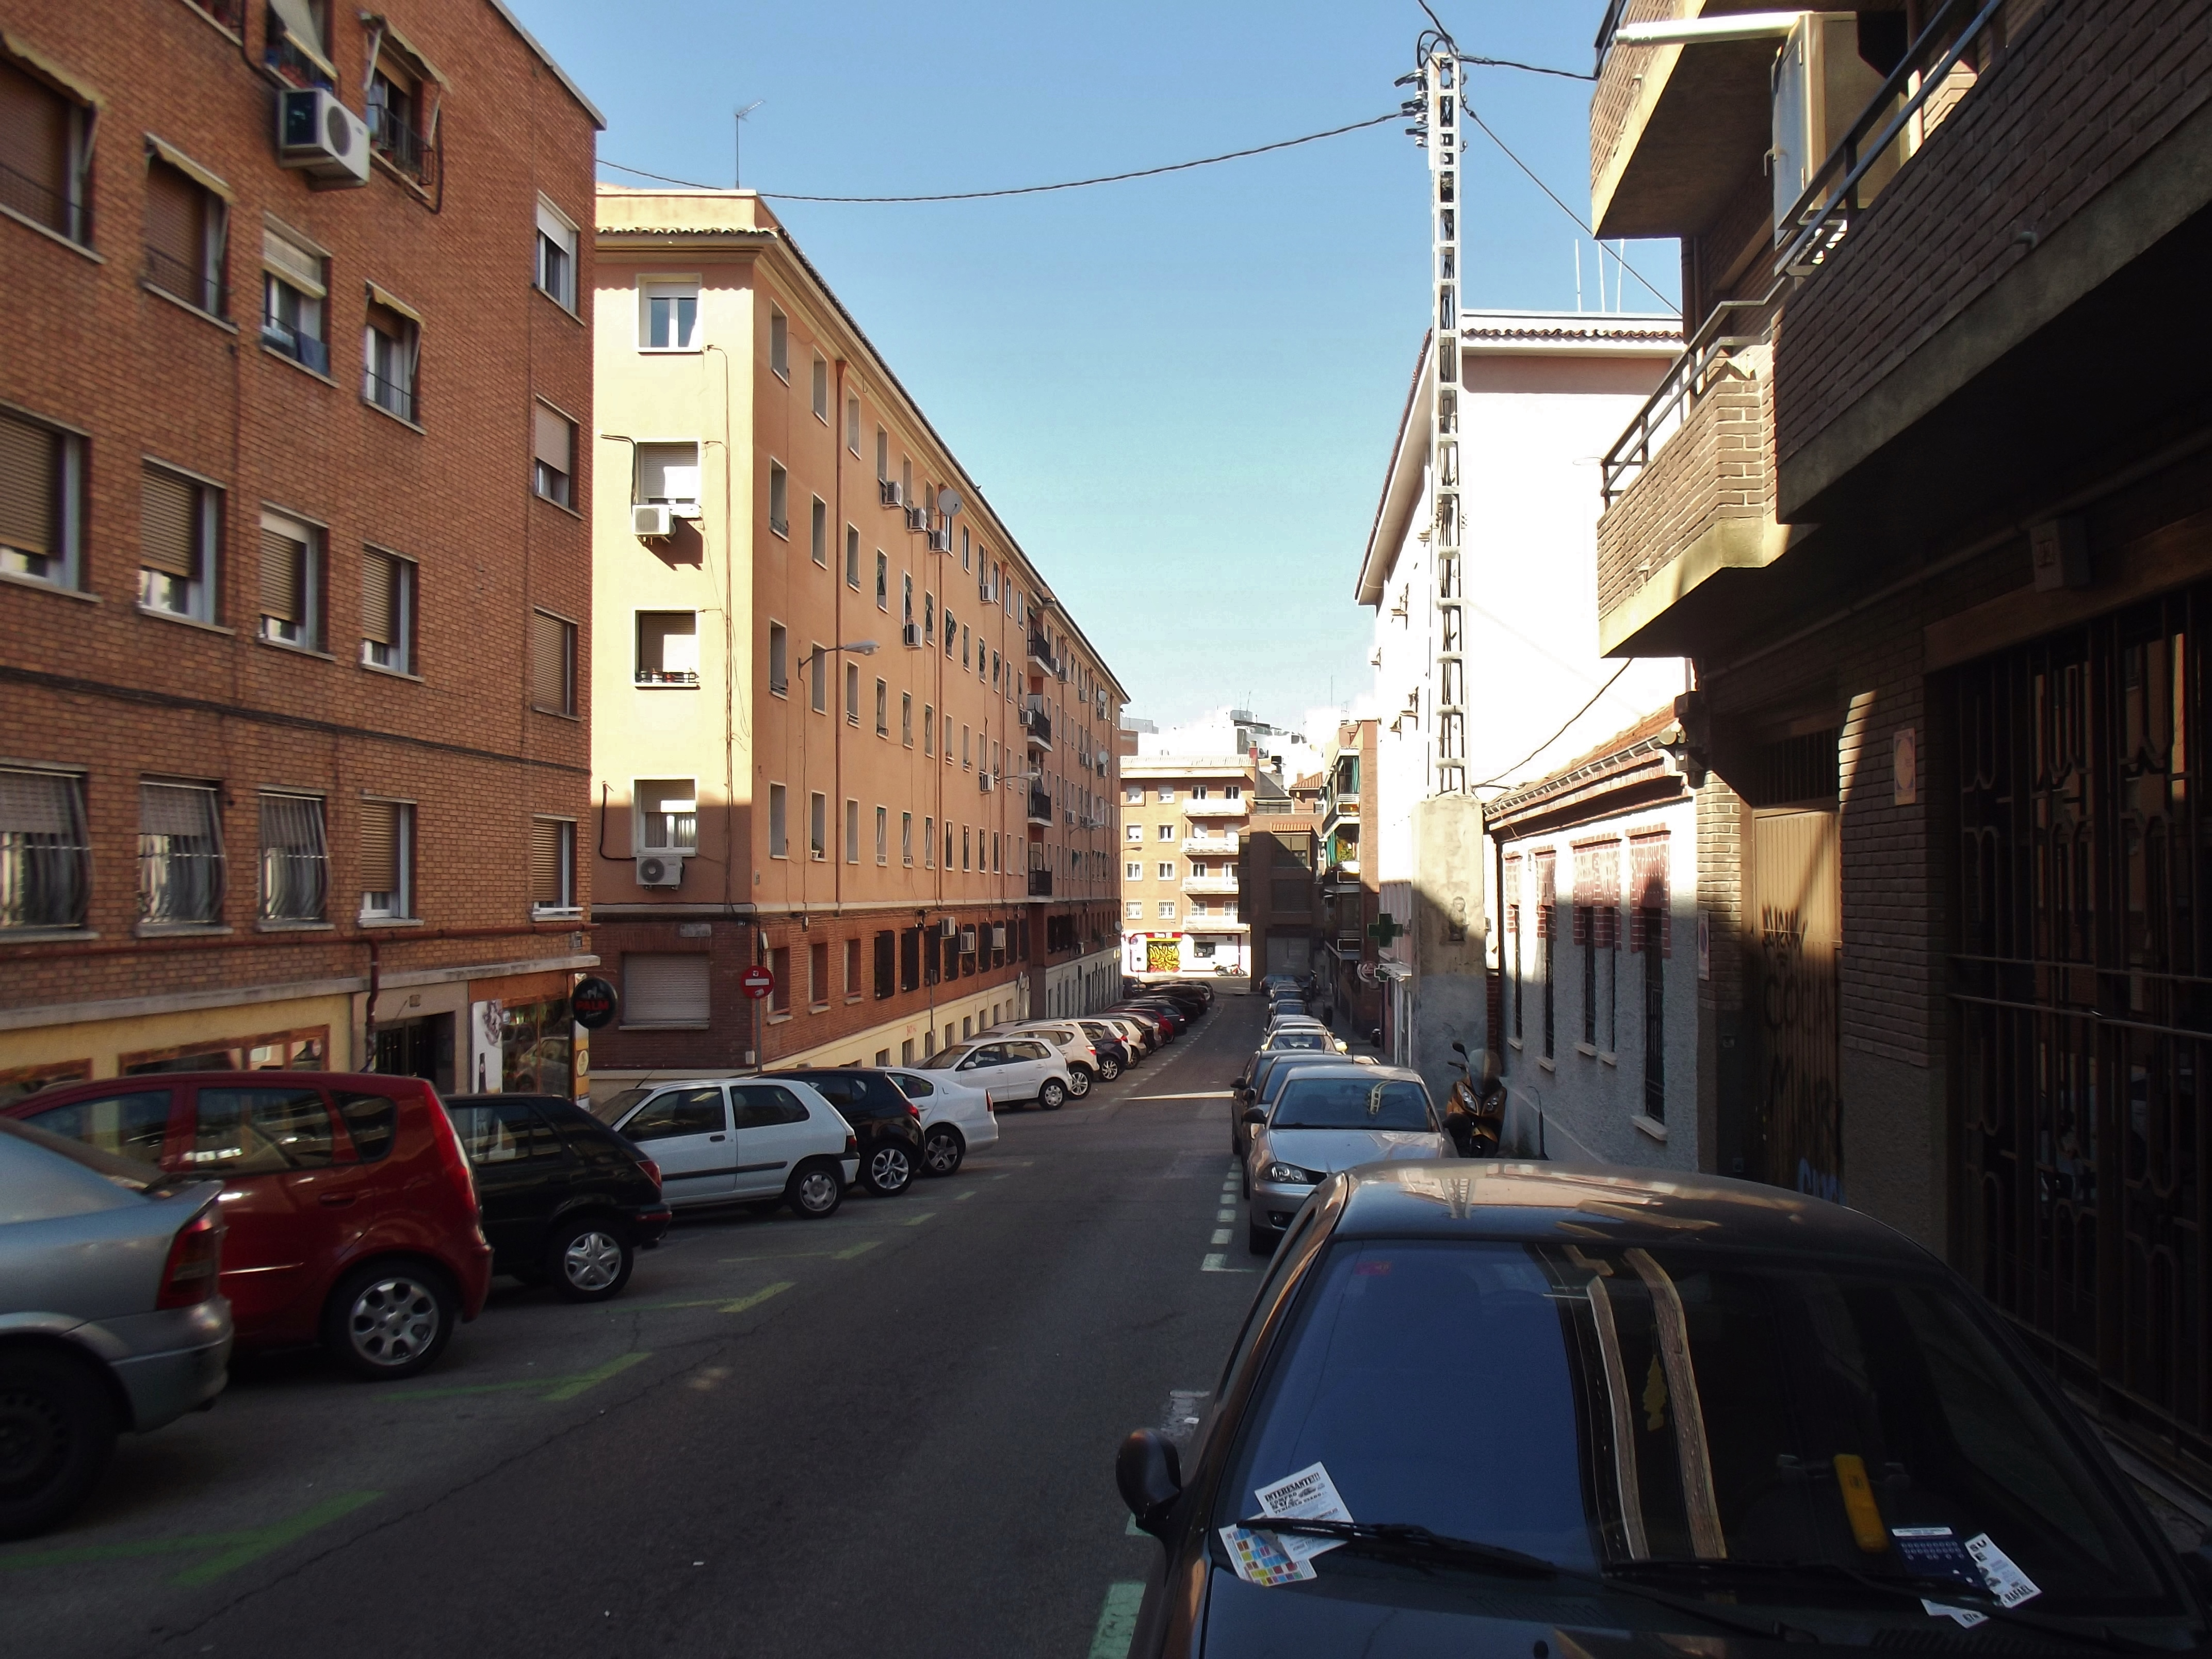 Archivo calle de olite madrid jpg wikipedia la enciclopedia libre - Calle nebulosas madrid ...